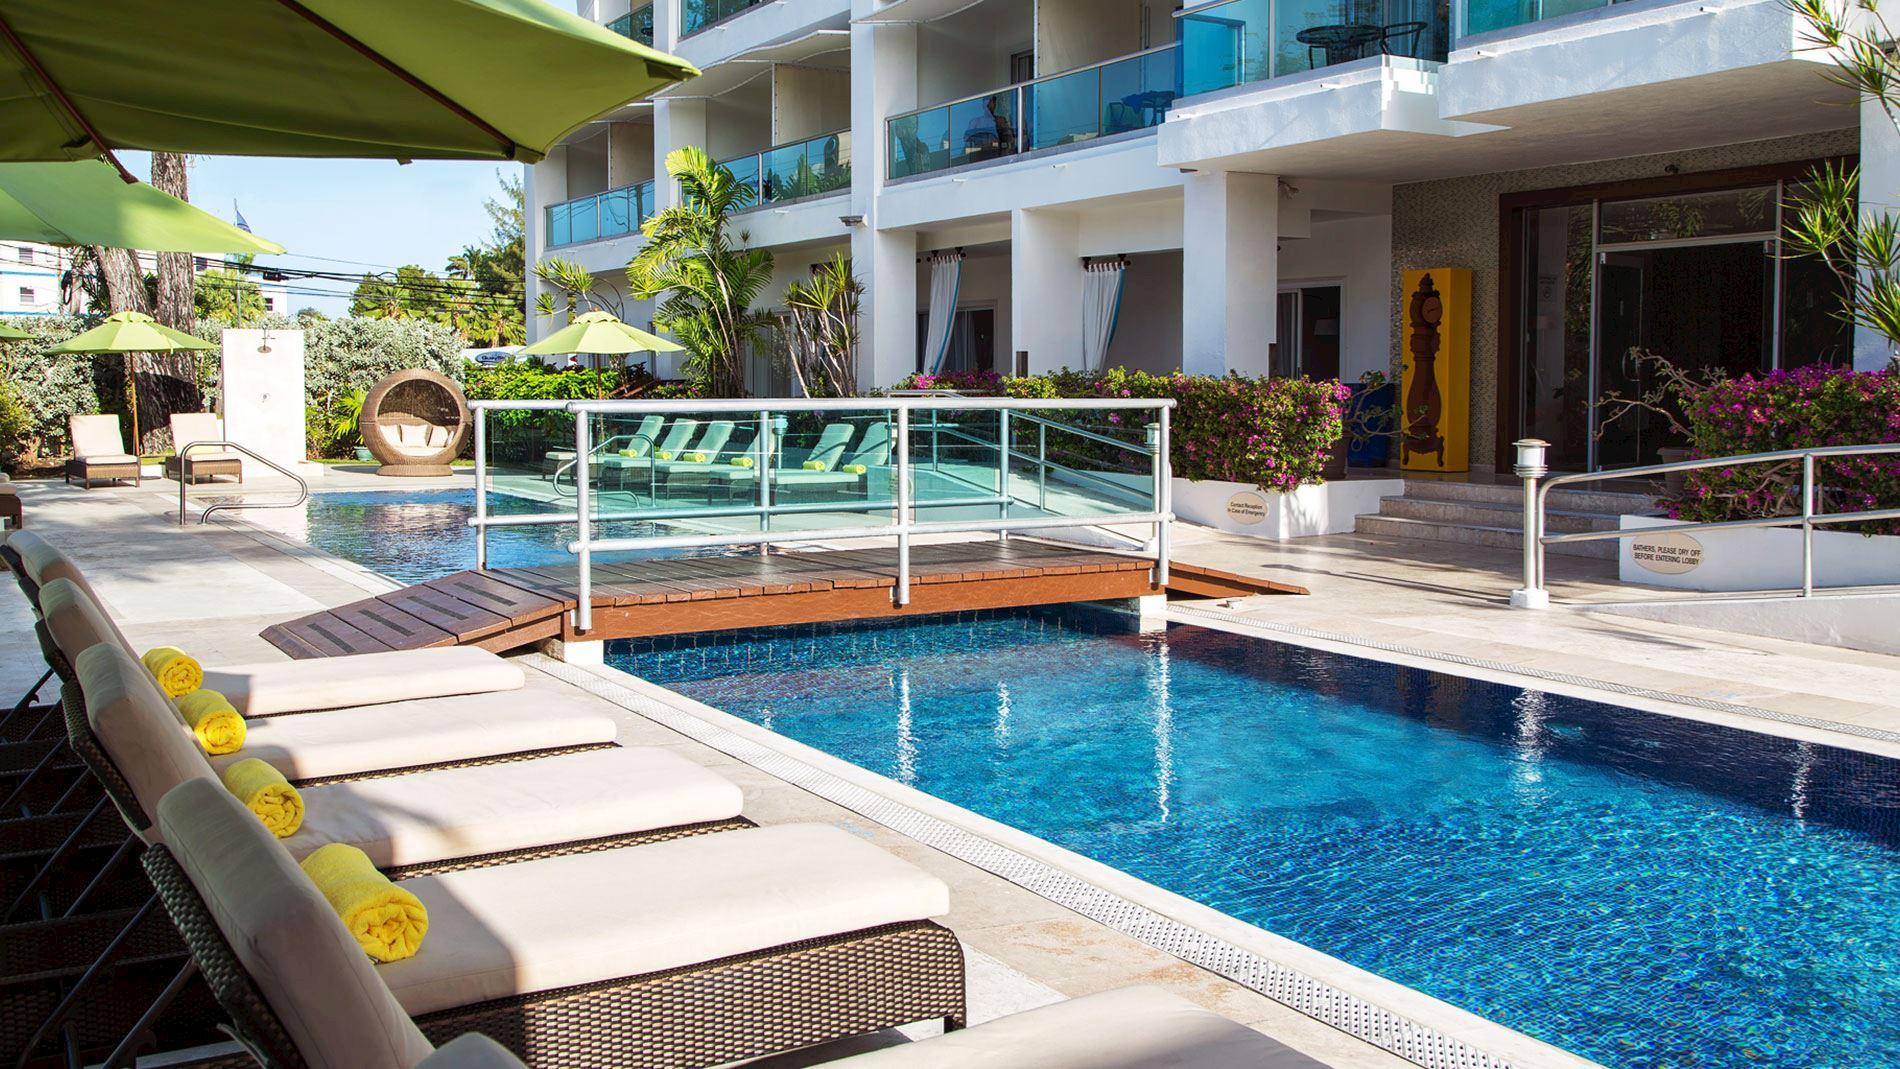 South Beach Hotel,Christ Church,Barbados